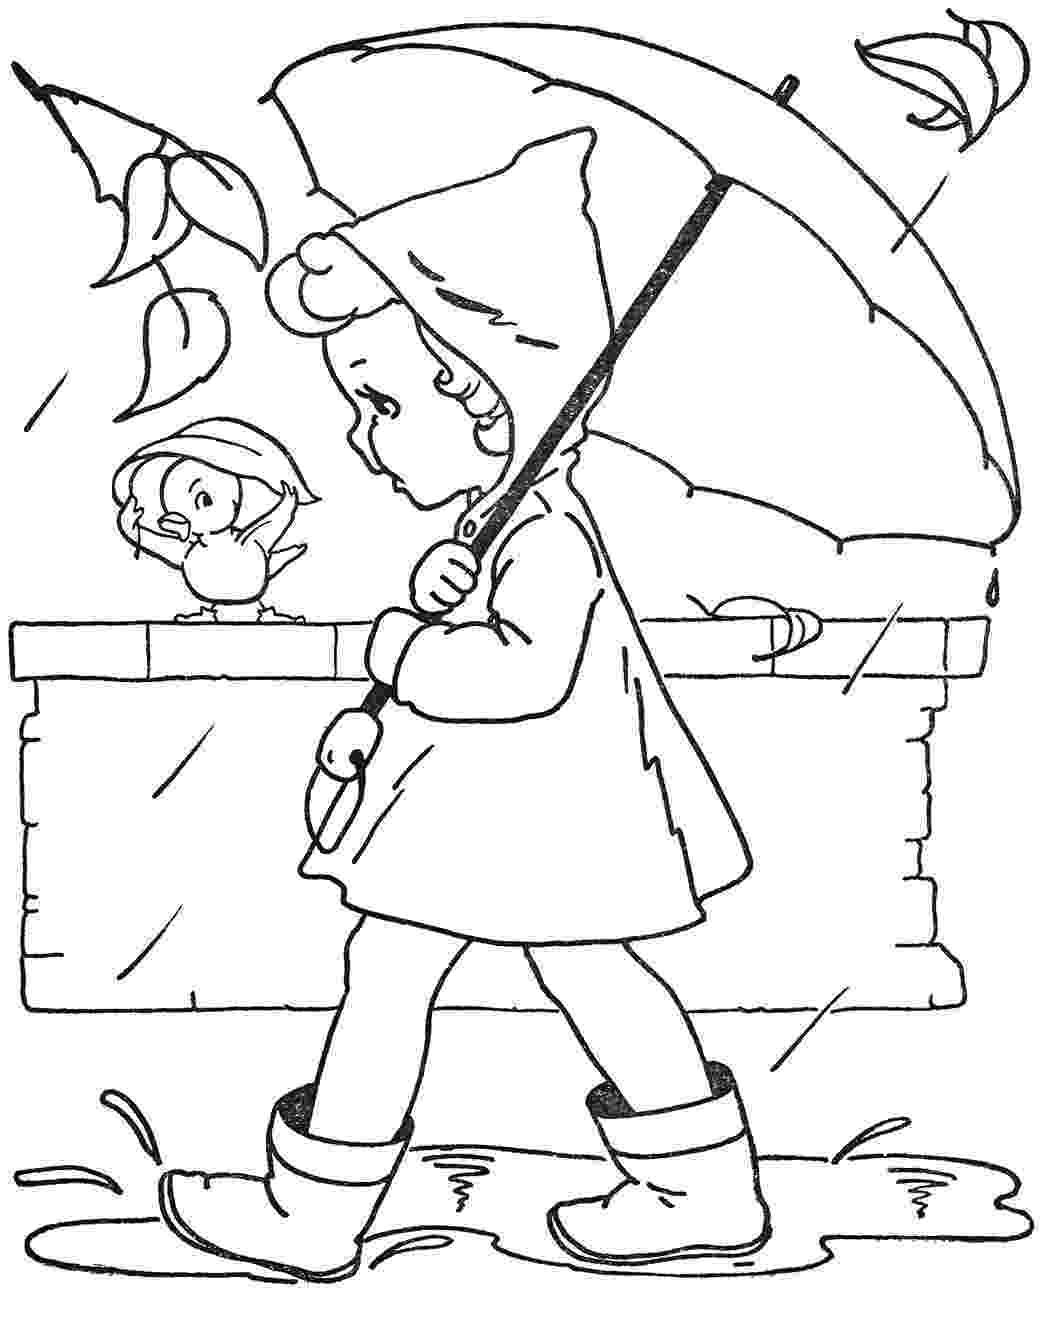 rain coloring page rain coloring page coloring home coloring rain page 1 1